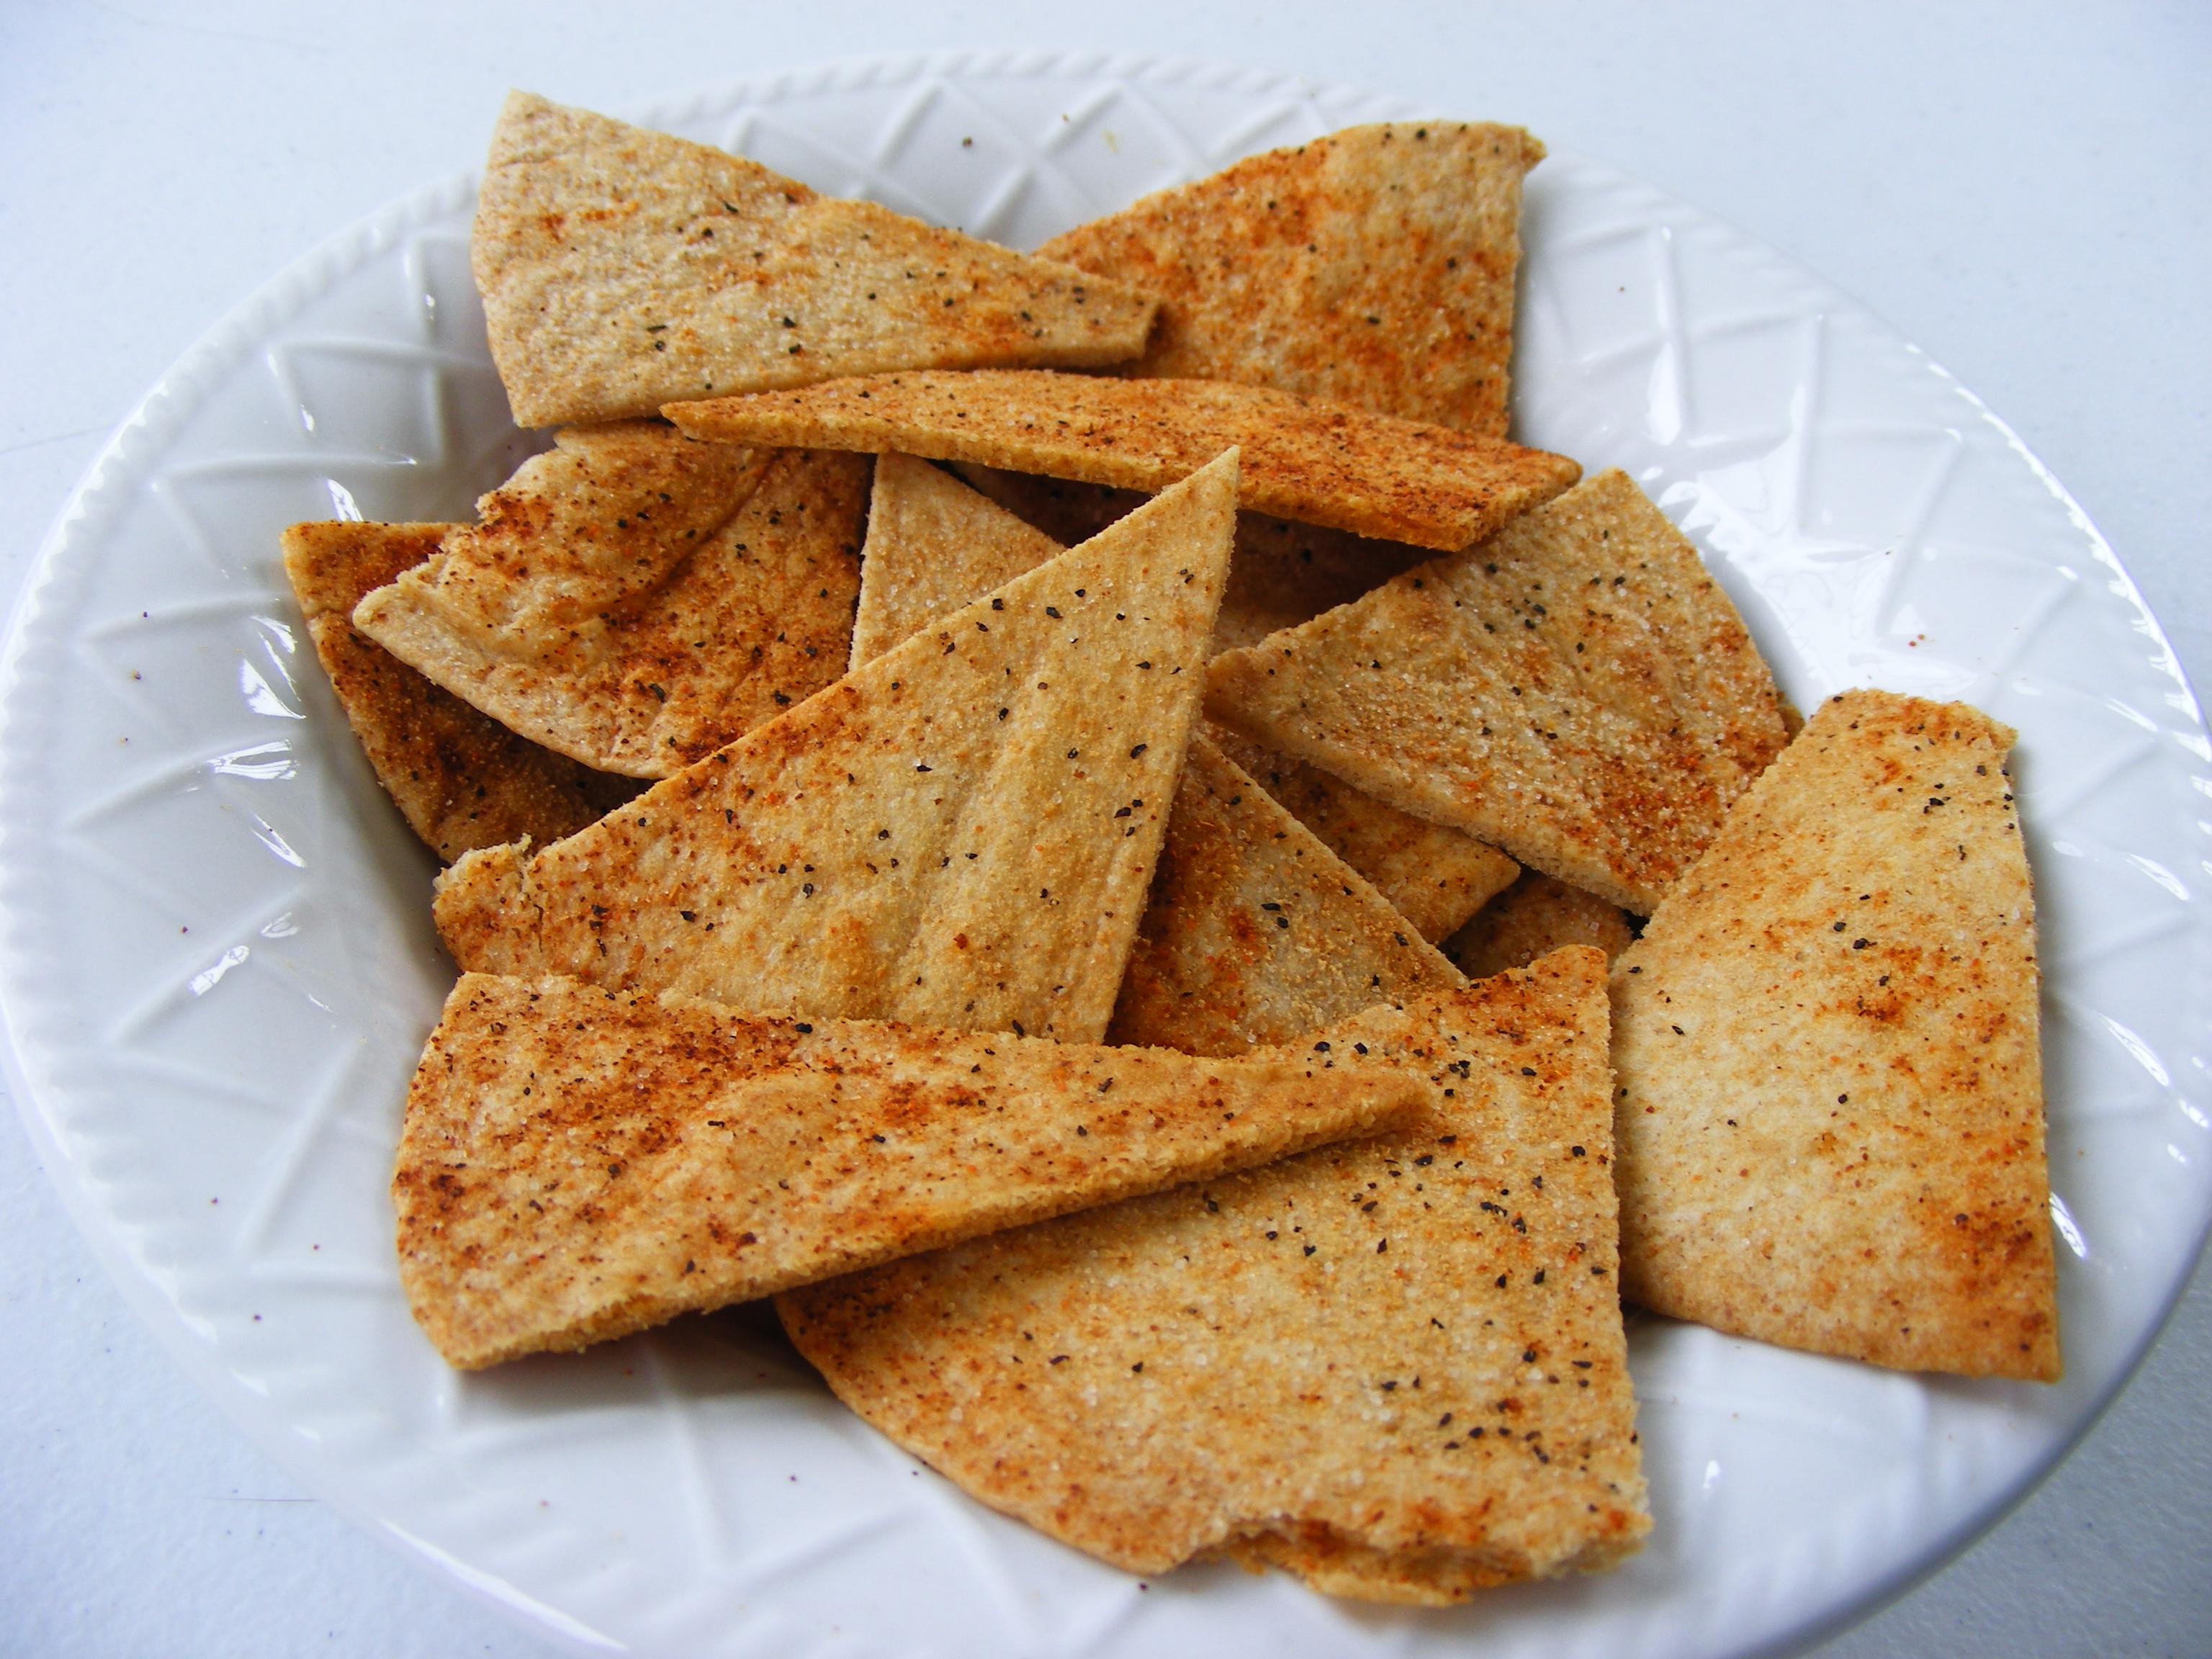 Homemade Baked Chips (Tortilla or Pita) Recipe